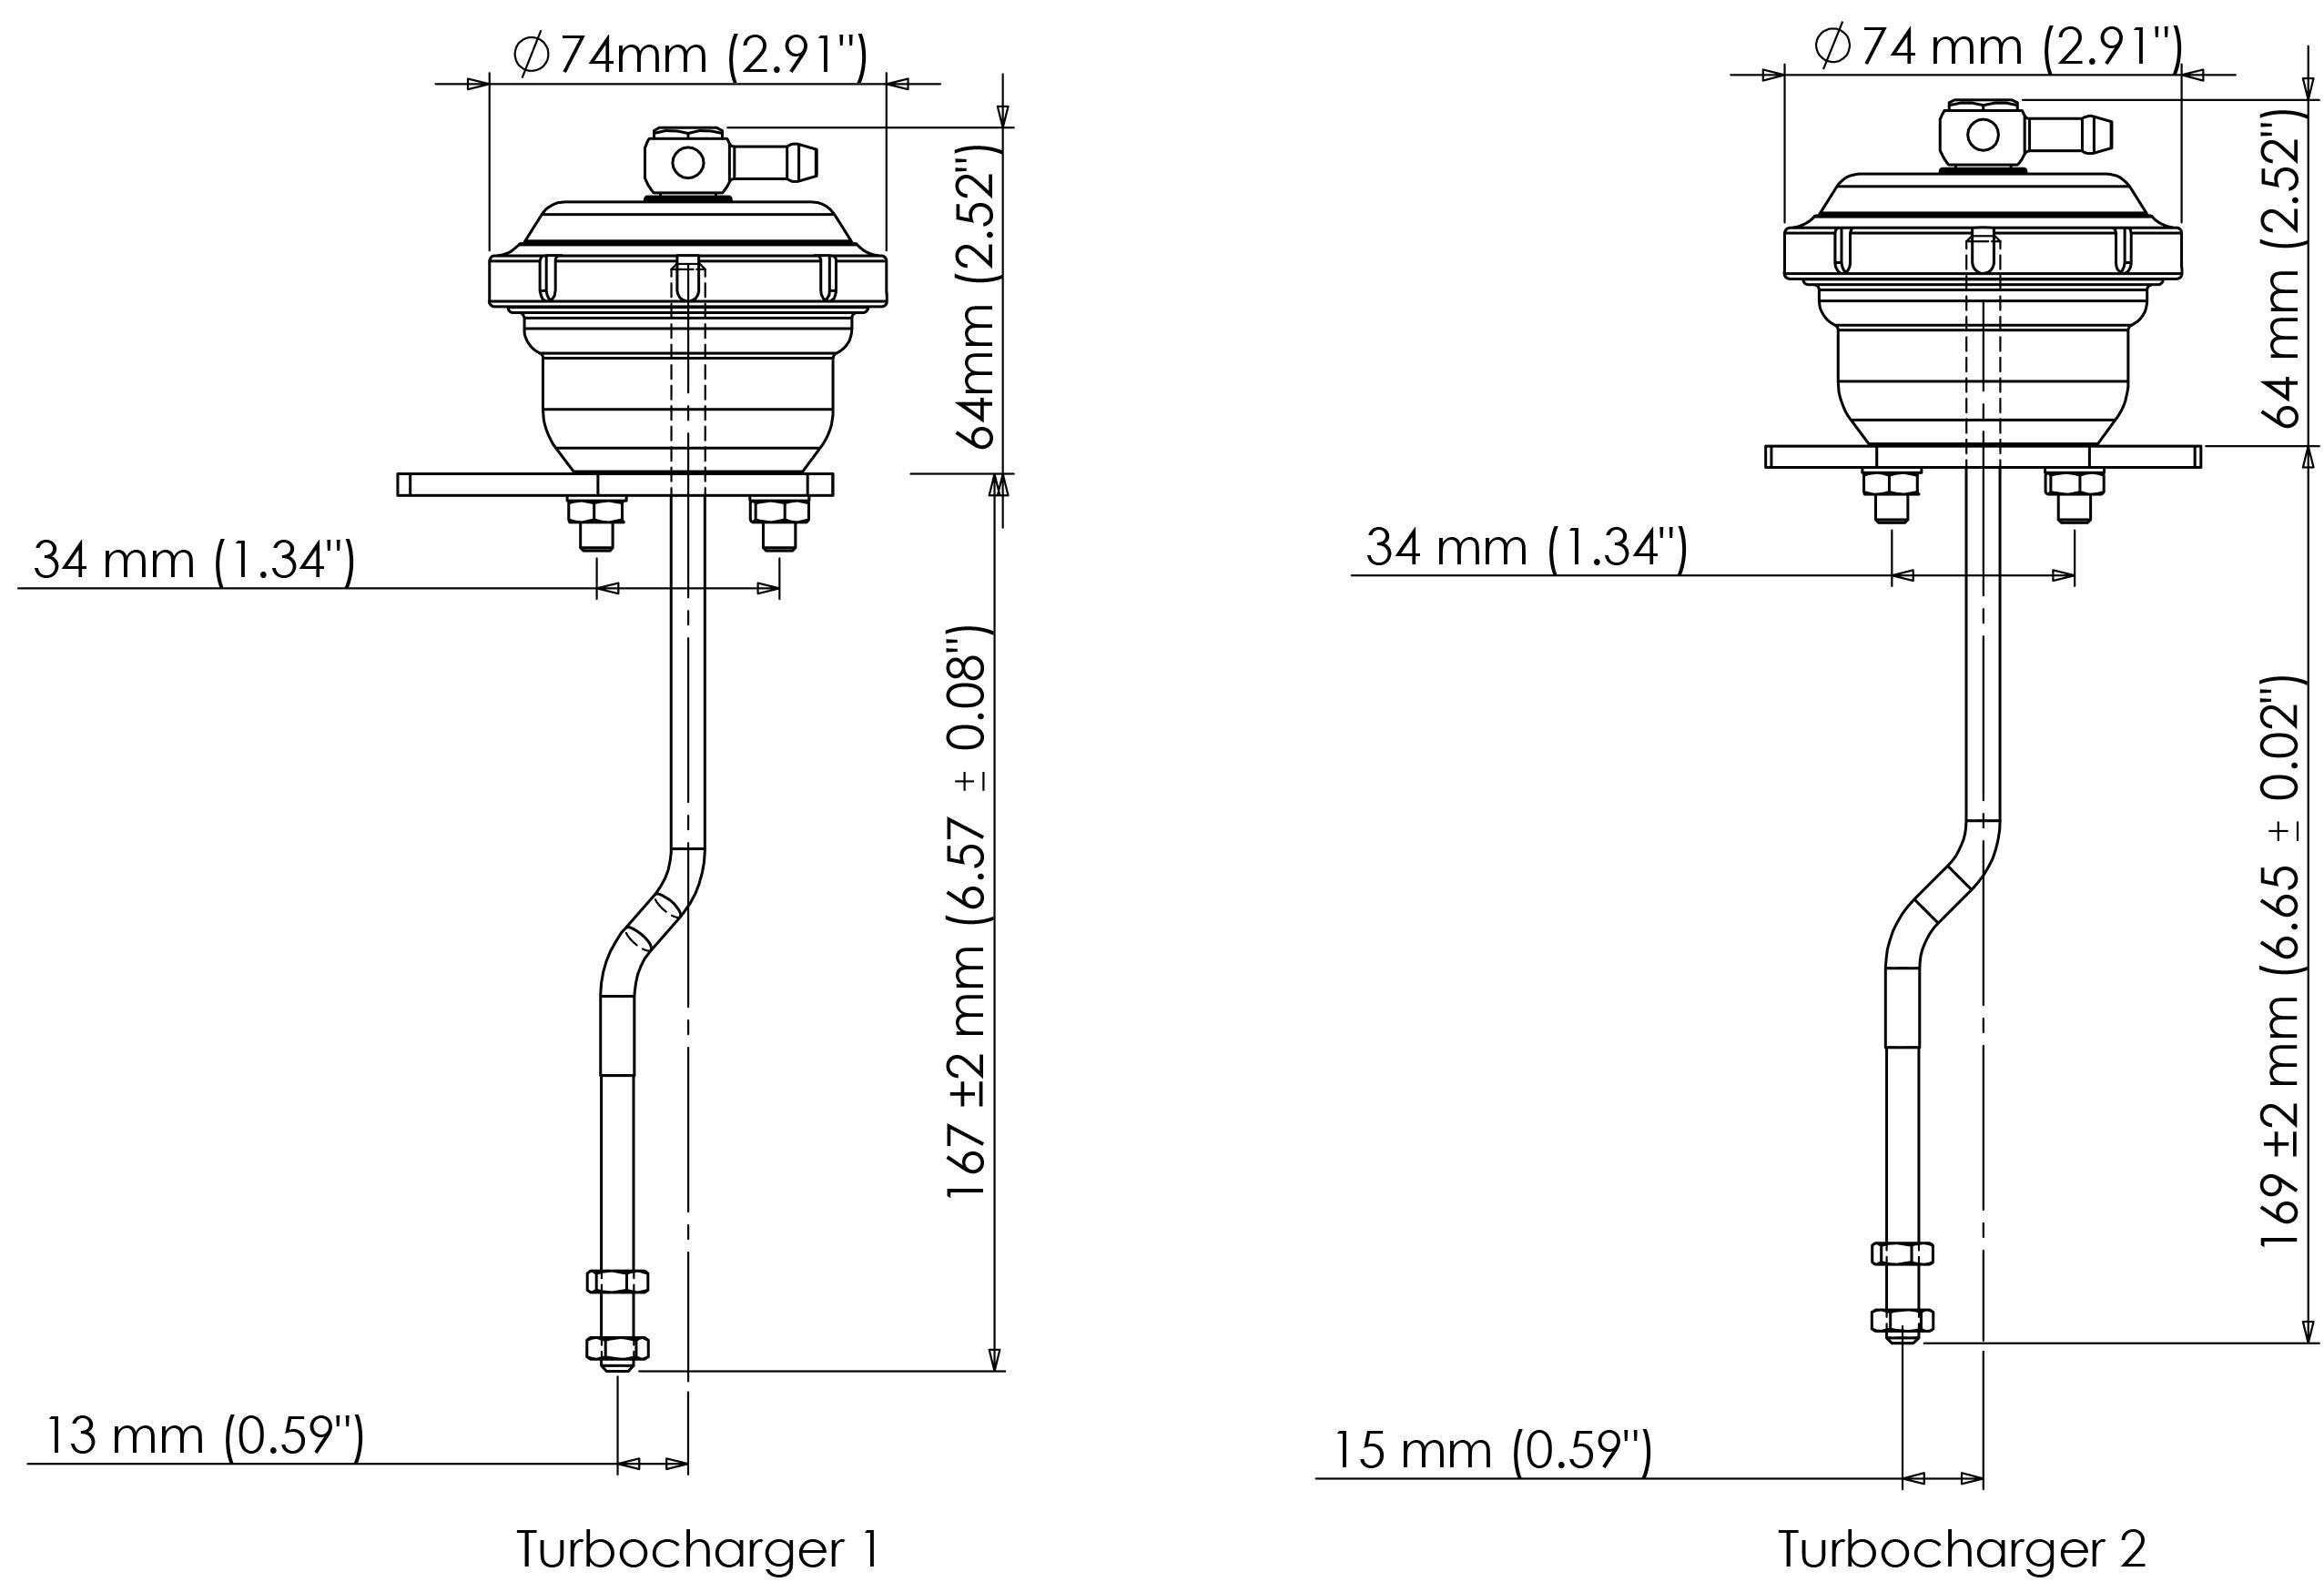 Turbocharger System Diagram Amazing Turbocharger Wastegate Diagram Ideas Electrical Diagram Of Turbocharger System Diagram